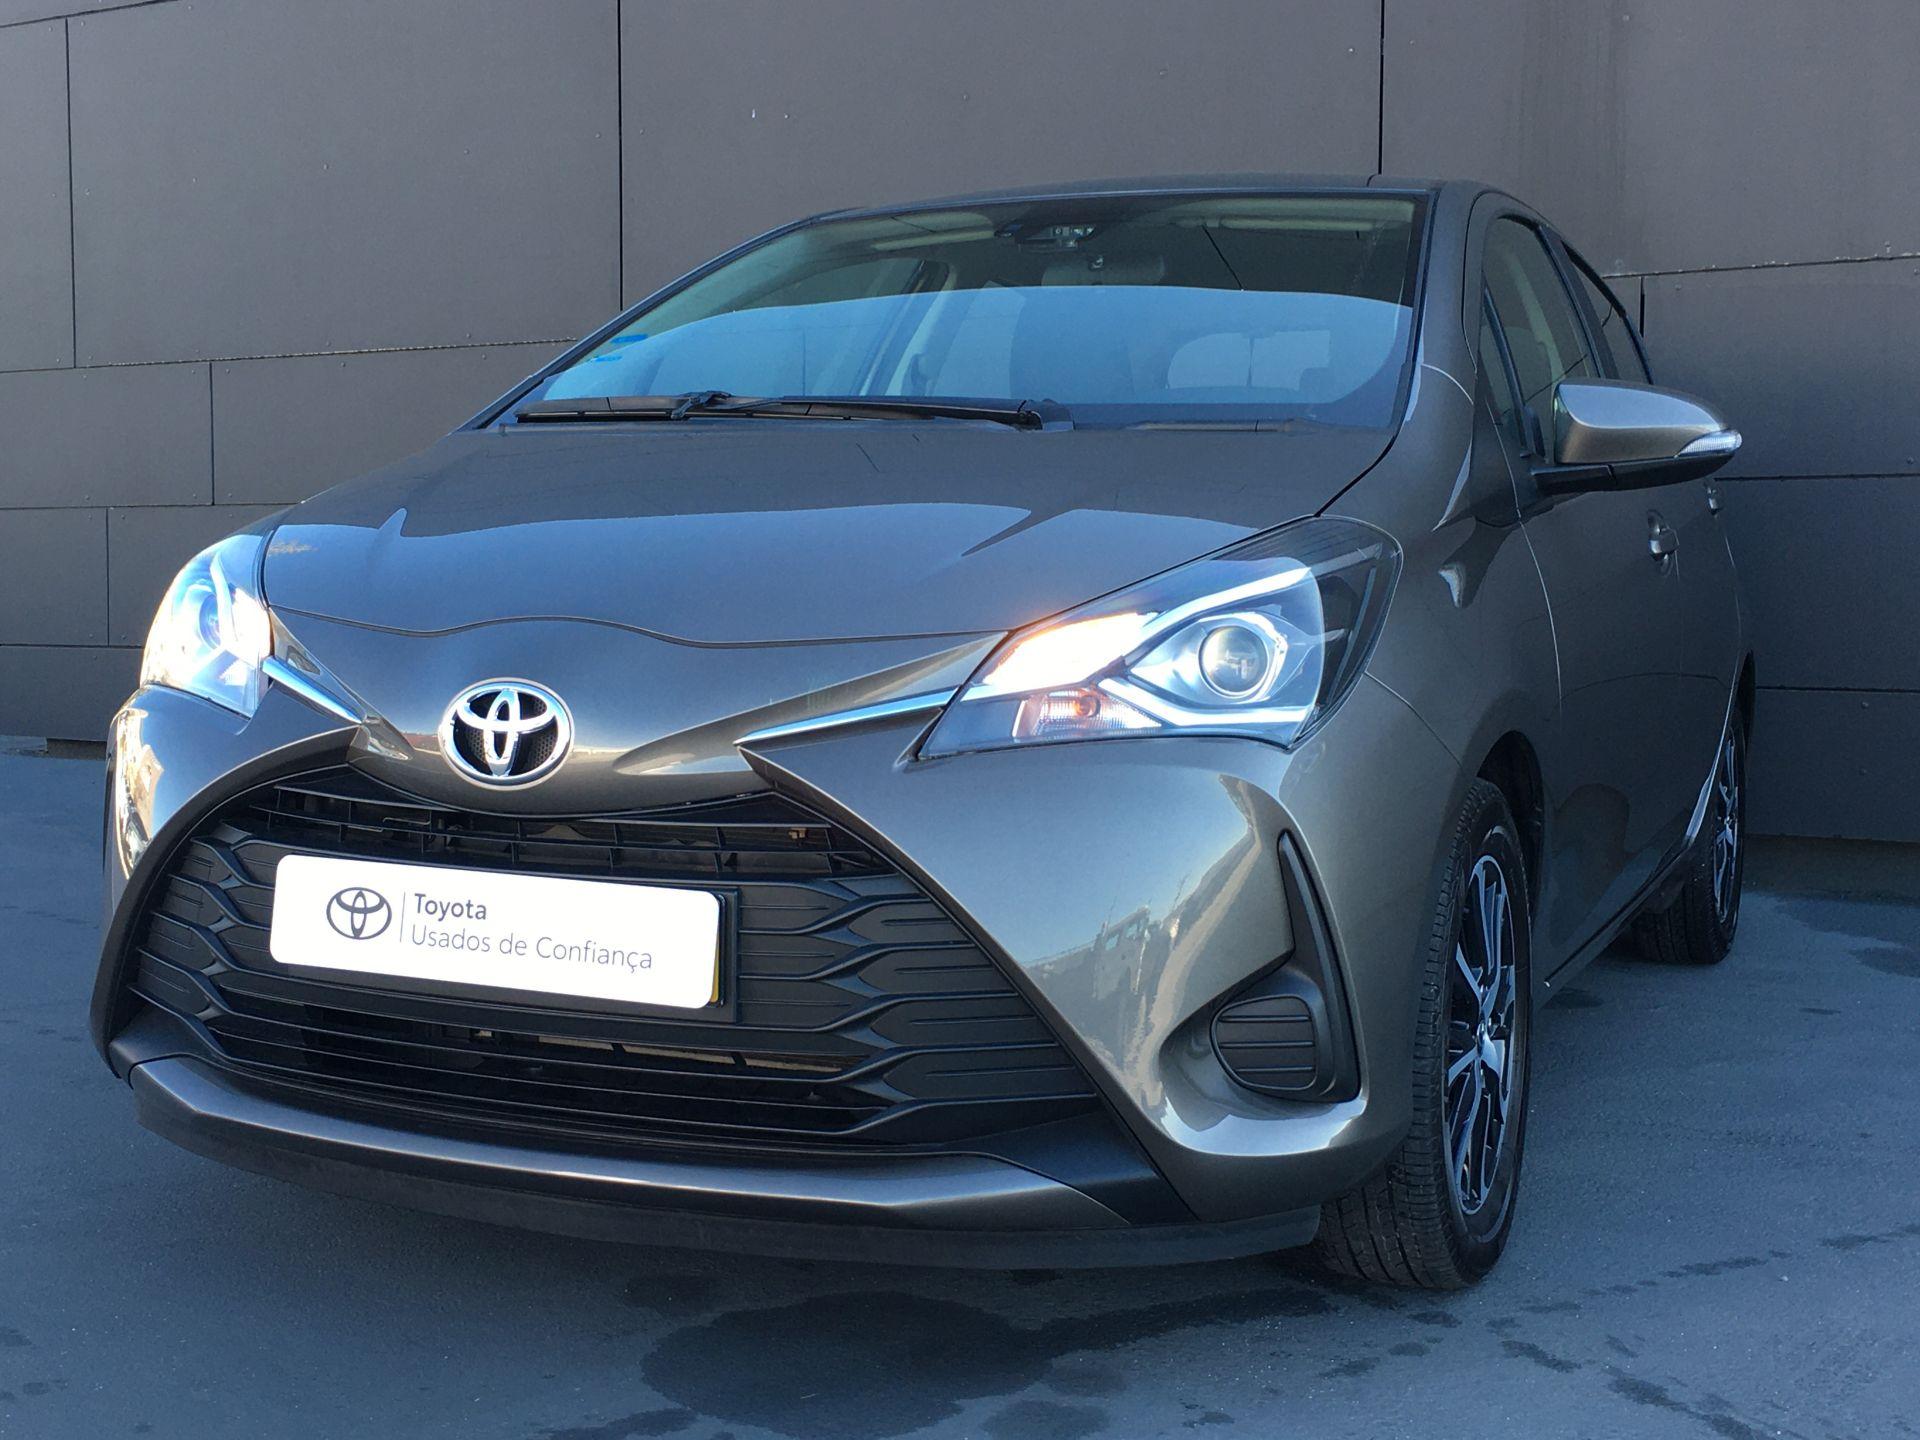 Toyota Yaris Yaris 1.0 5P Comfort usada Faro